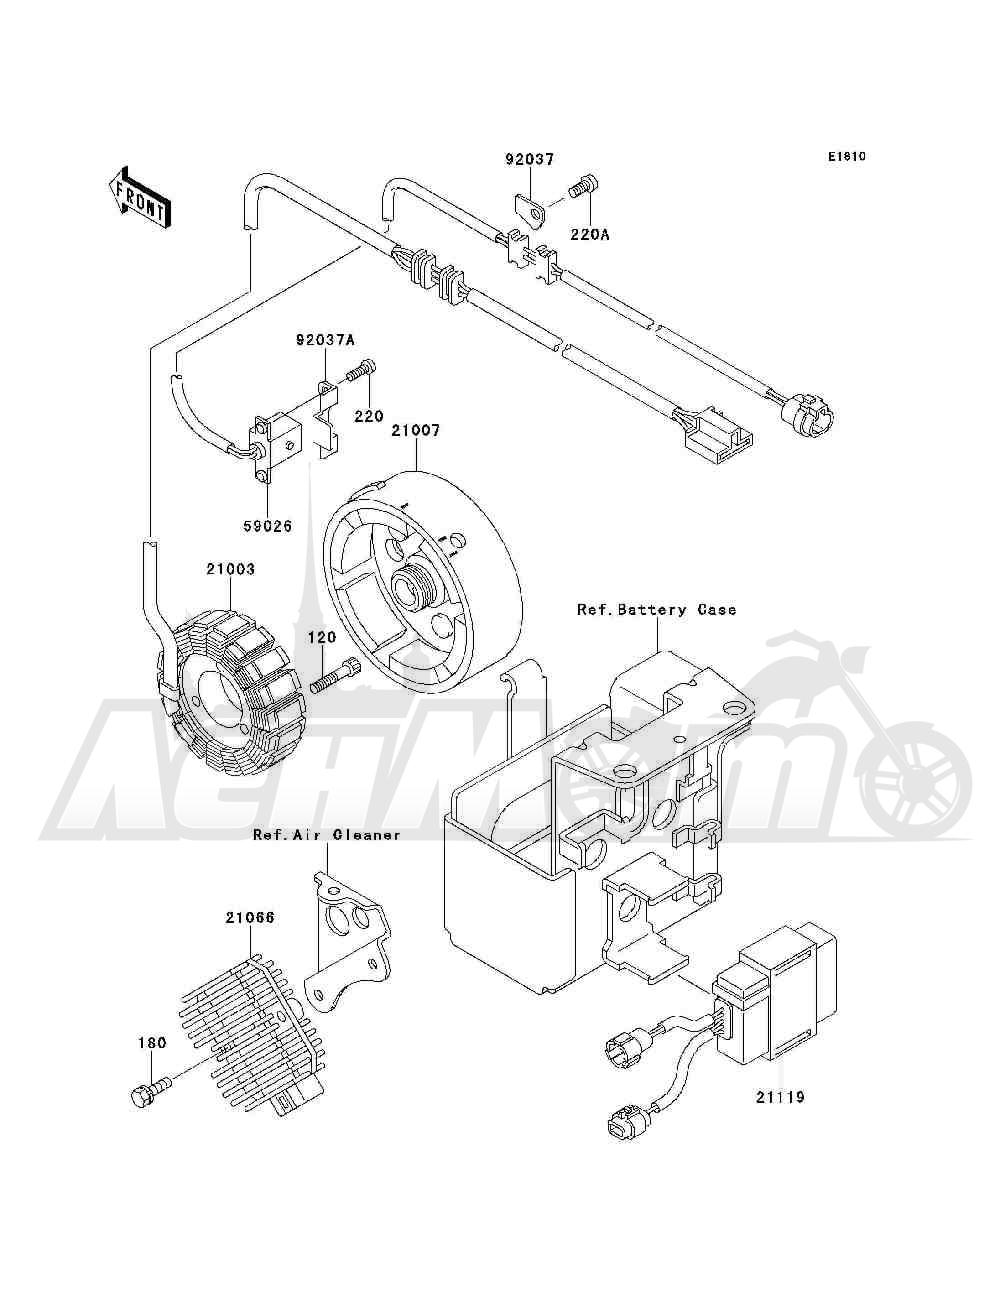 Запчасти для Квадроцикла Kawasaki 1994 BAYOU 300 4X4 (KLF300-C6) Раздел: GENERATOR | генератор